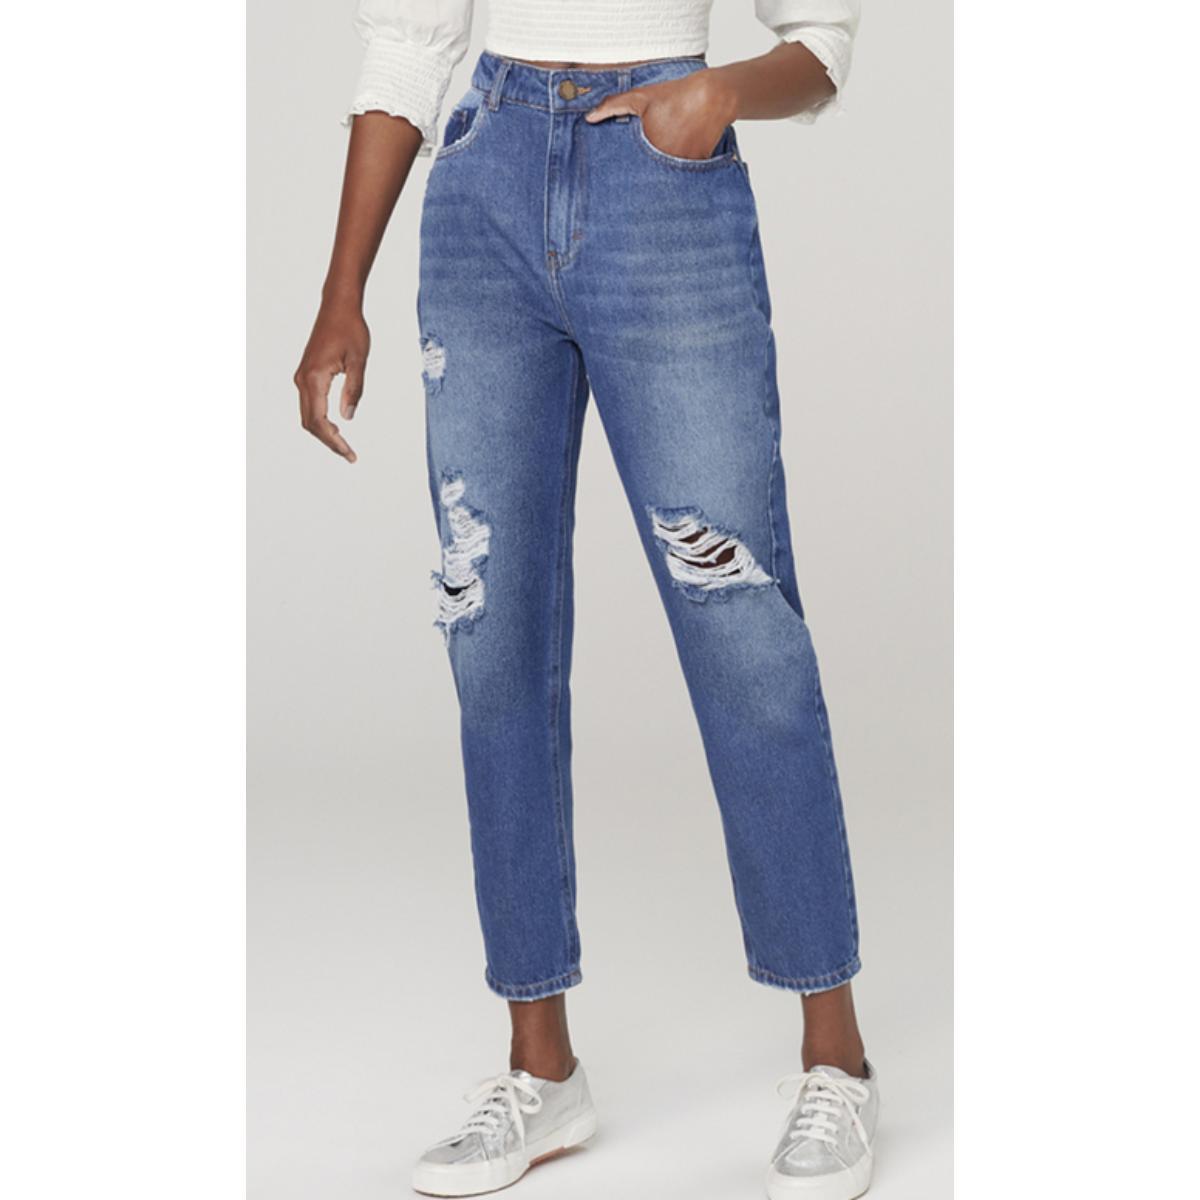 Calça Feminina Dzarm Z1r6 1bsn Jeans